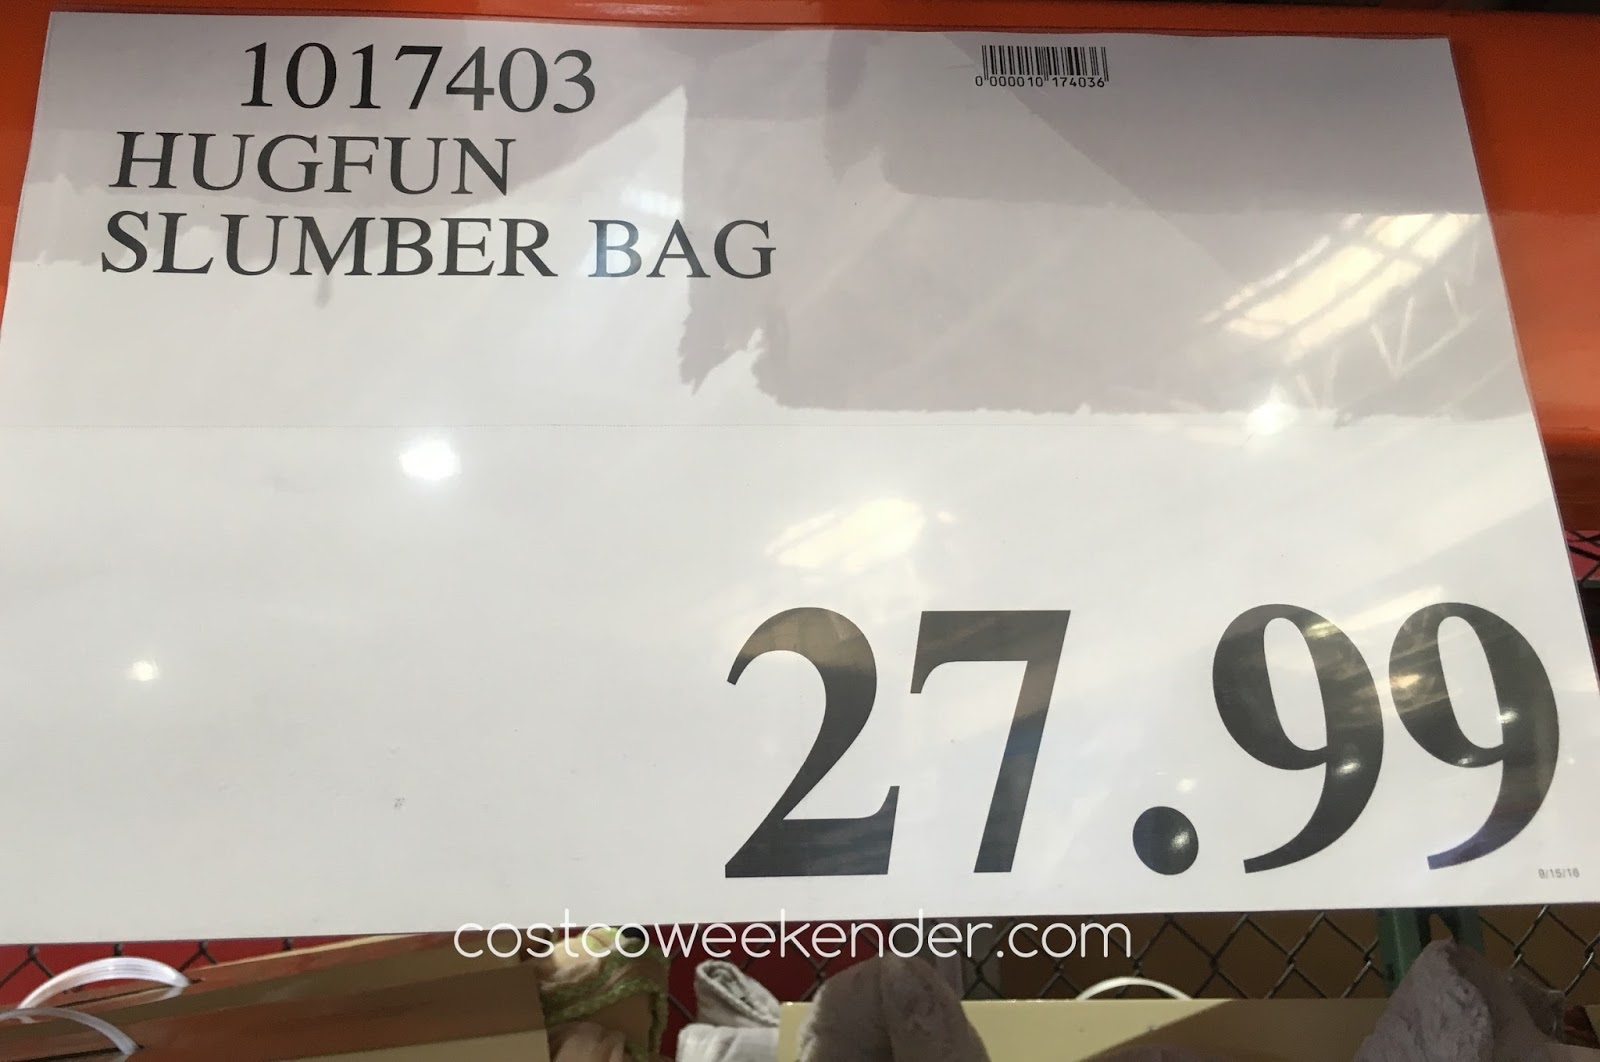 28990afc79e88 Deal for the Hug Fun Slumber Bag at Costco